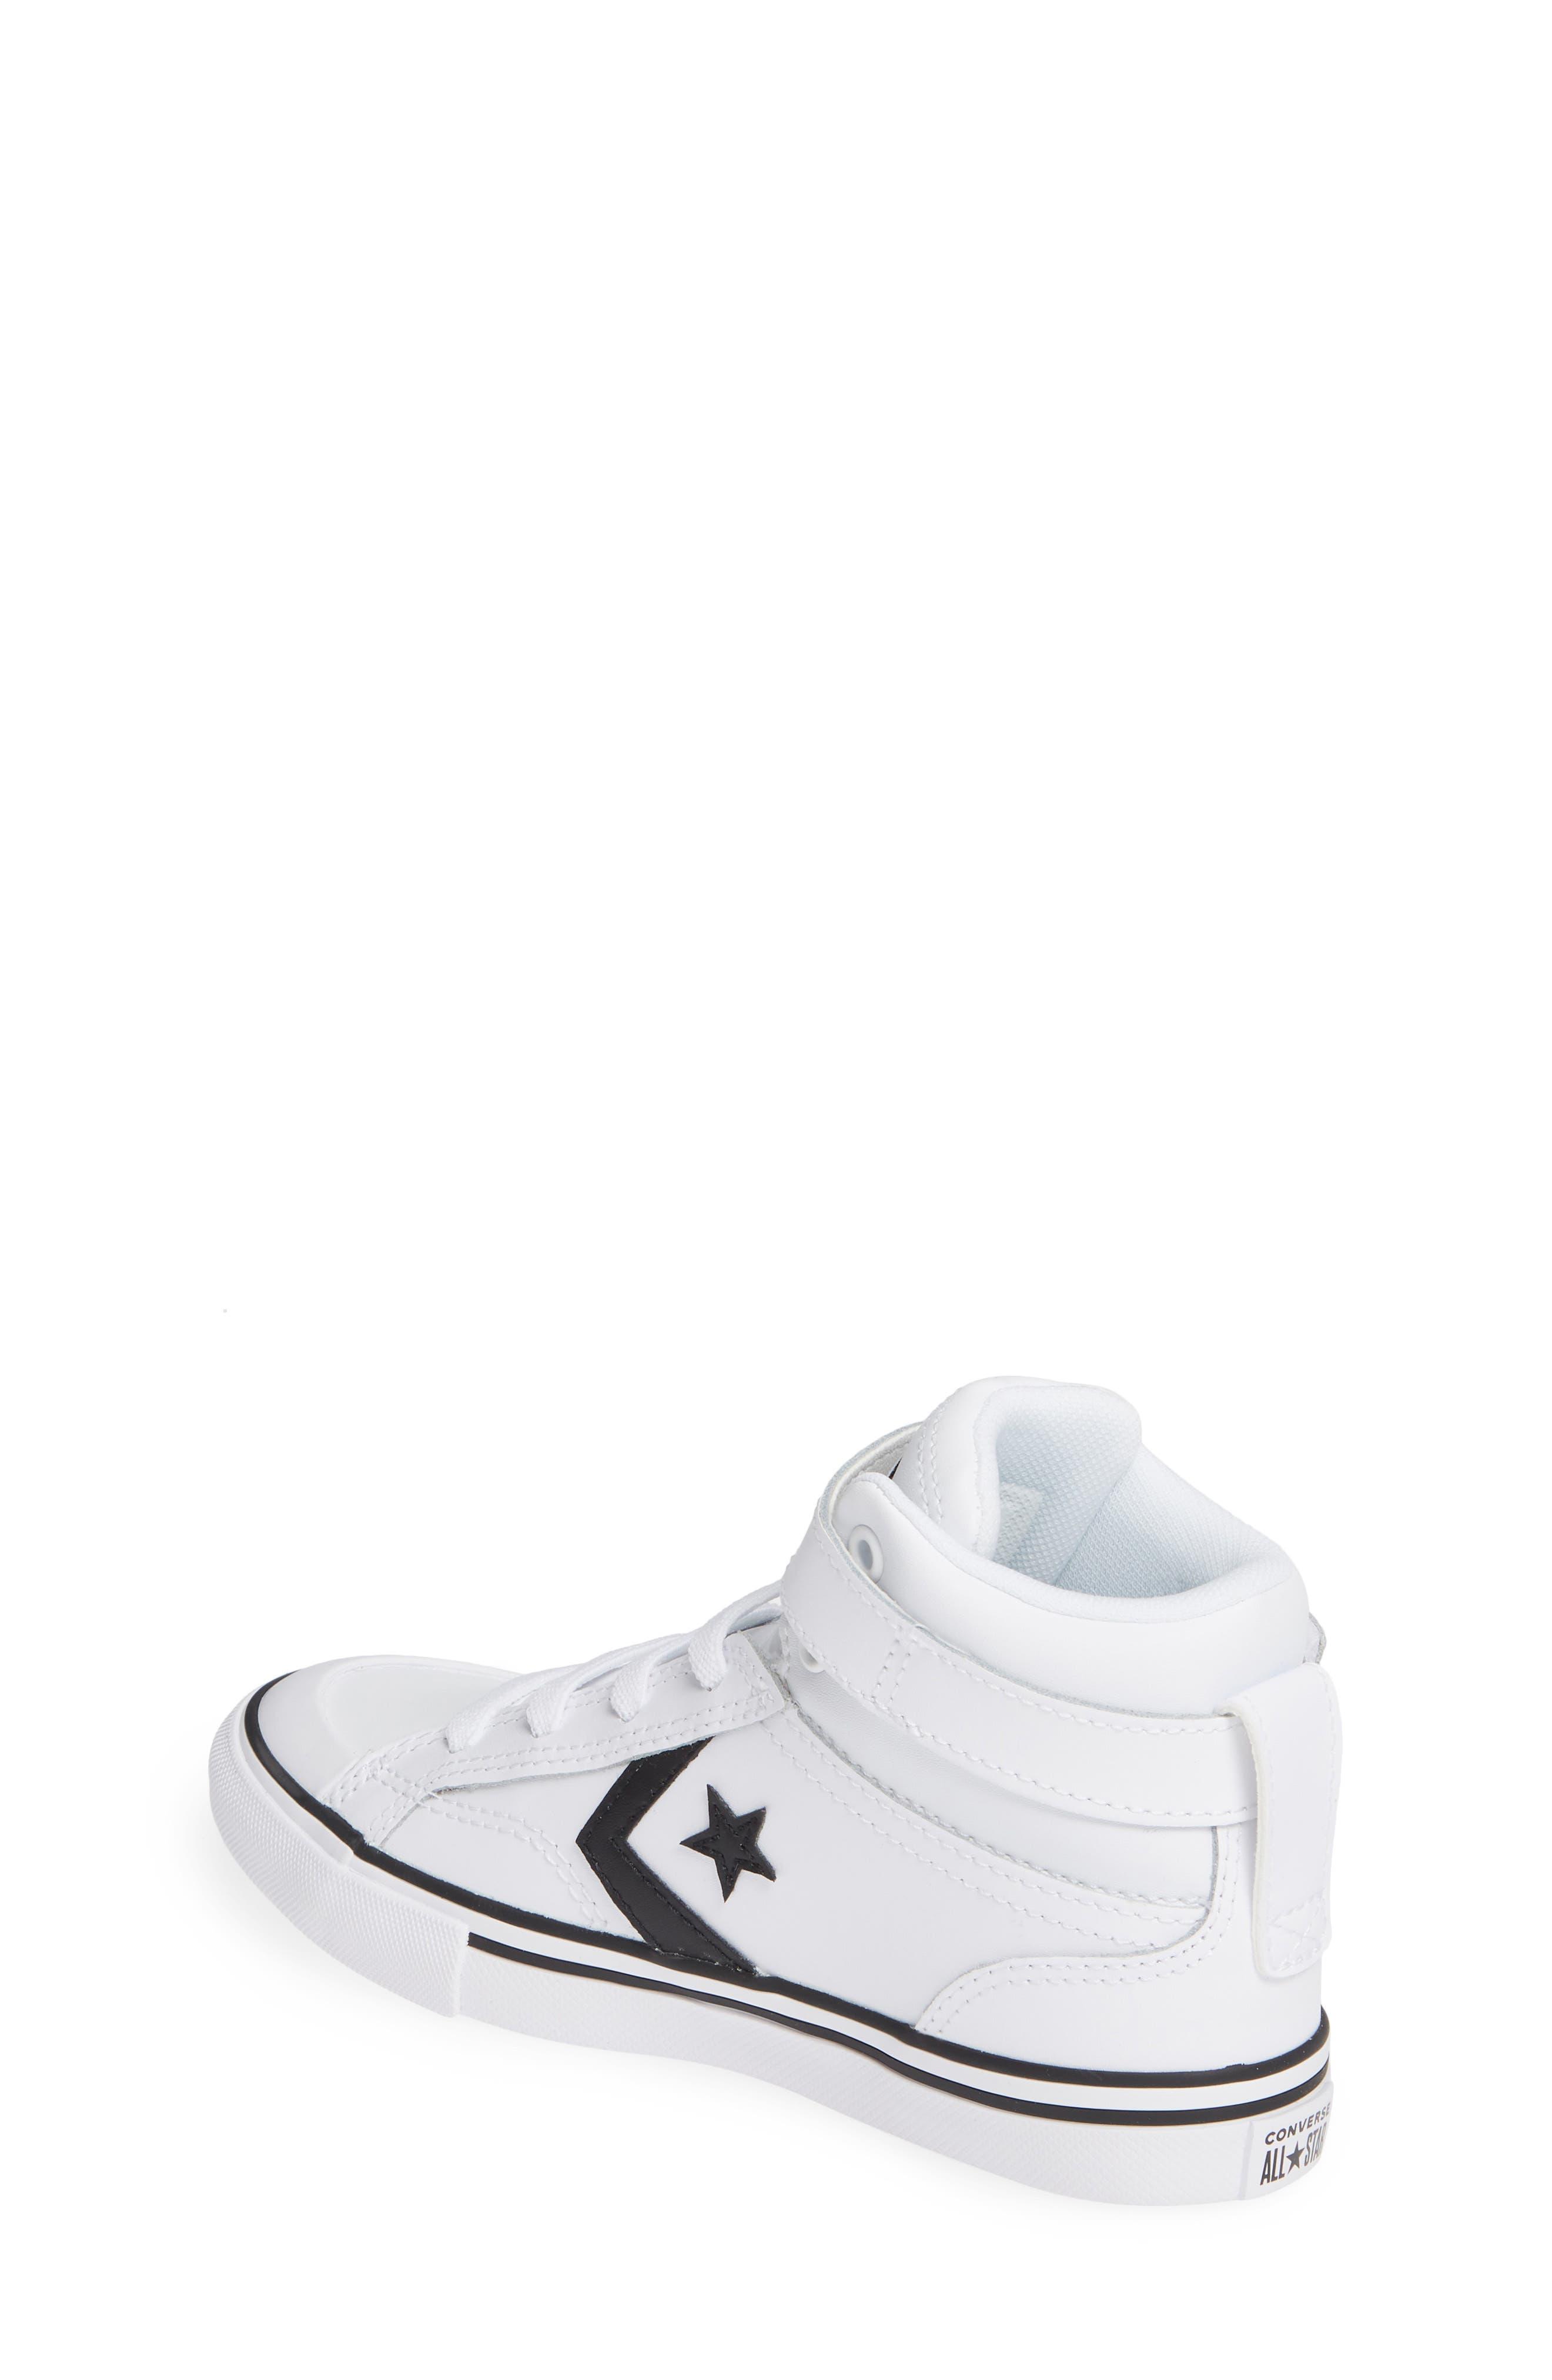 CONVERSE, Pro Blaze High Top Sneaker, Alternate thumbnail 2, color, WHITE/ BLACK/ WHITE